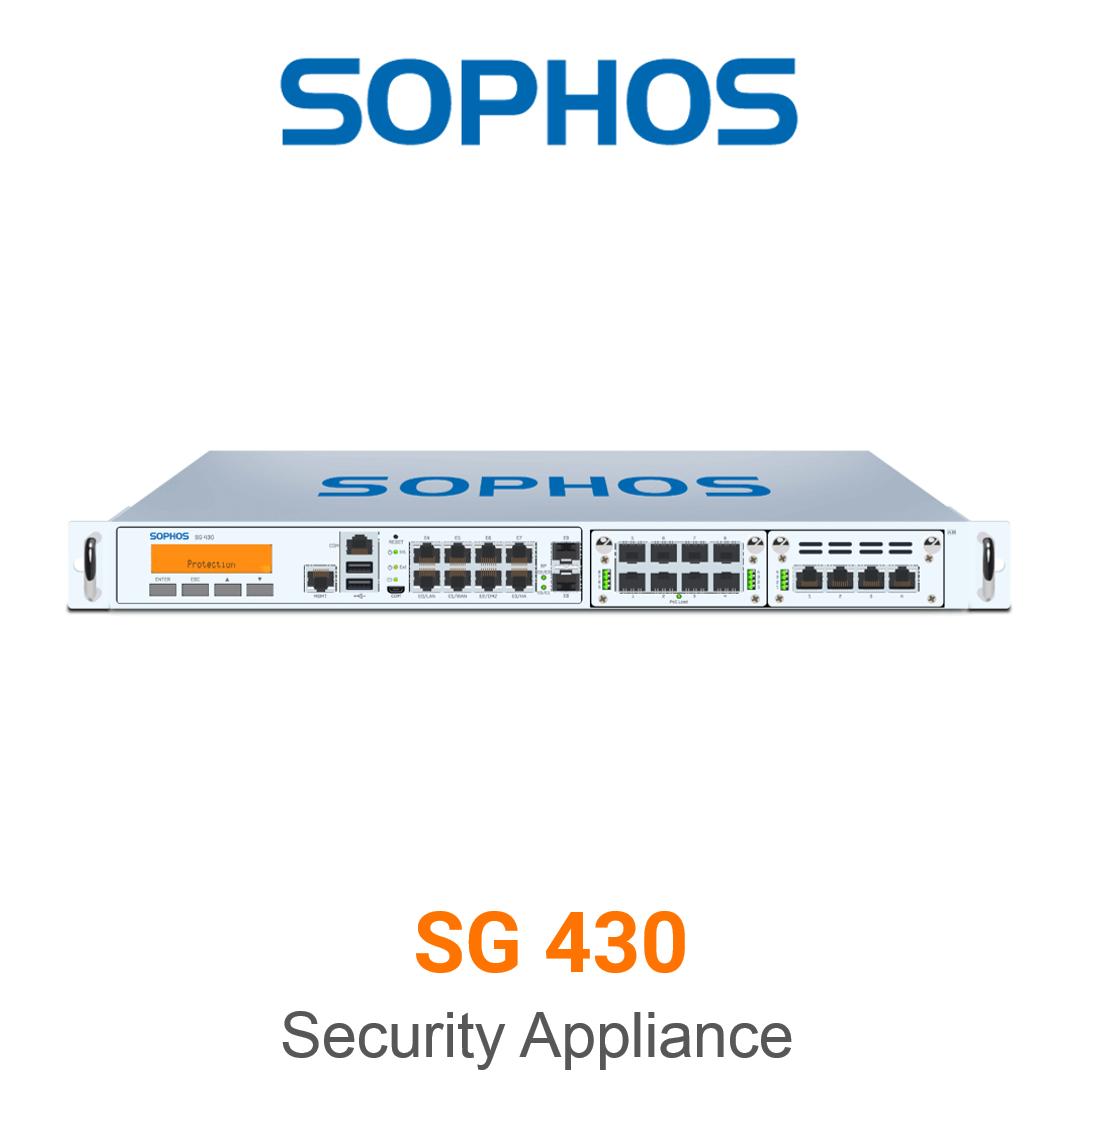 Sophos SG 430 Securiy Appliance